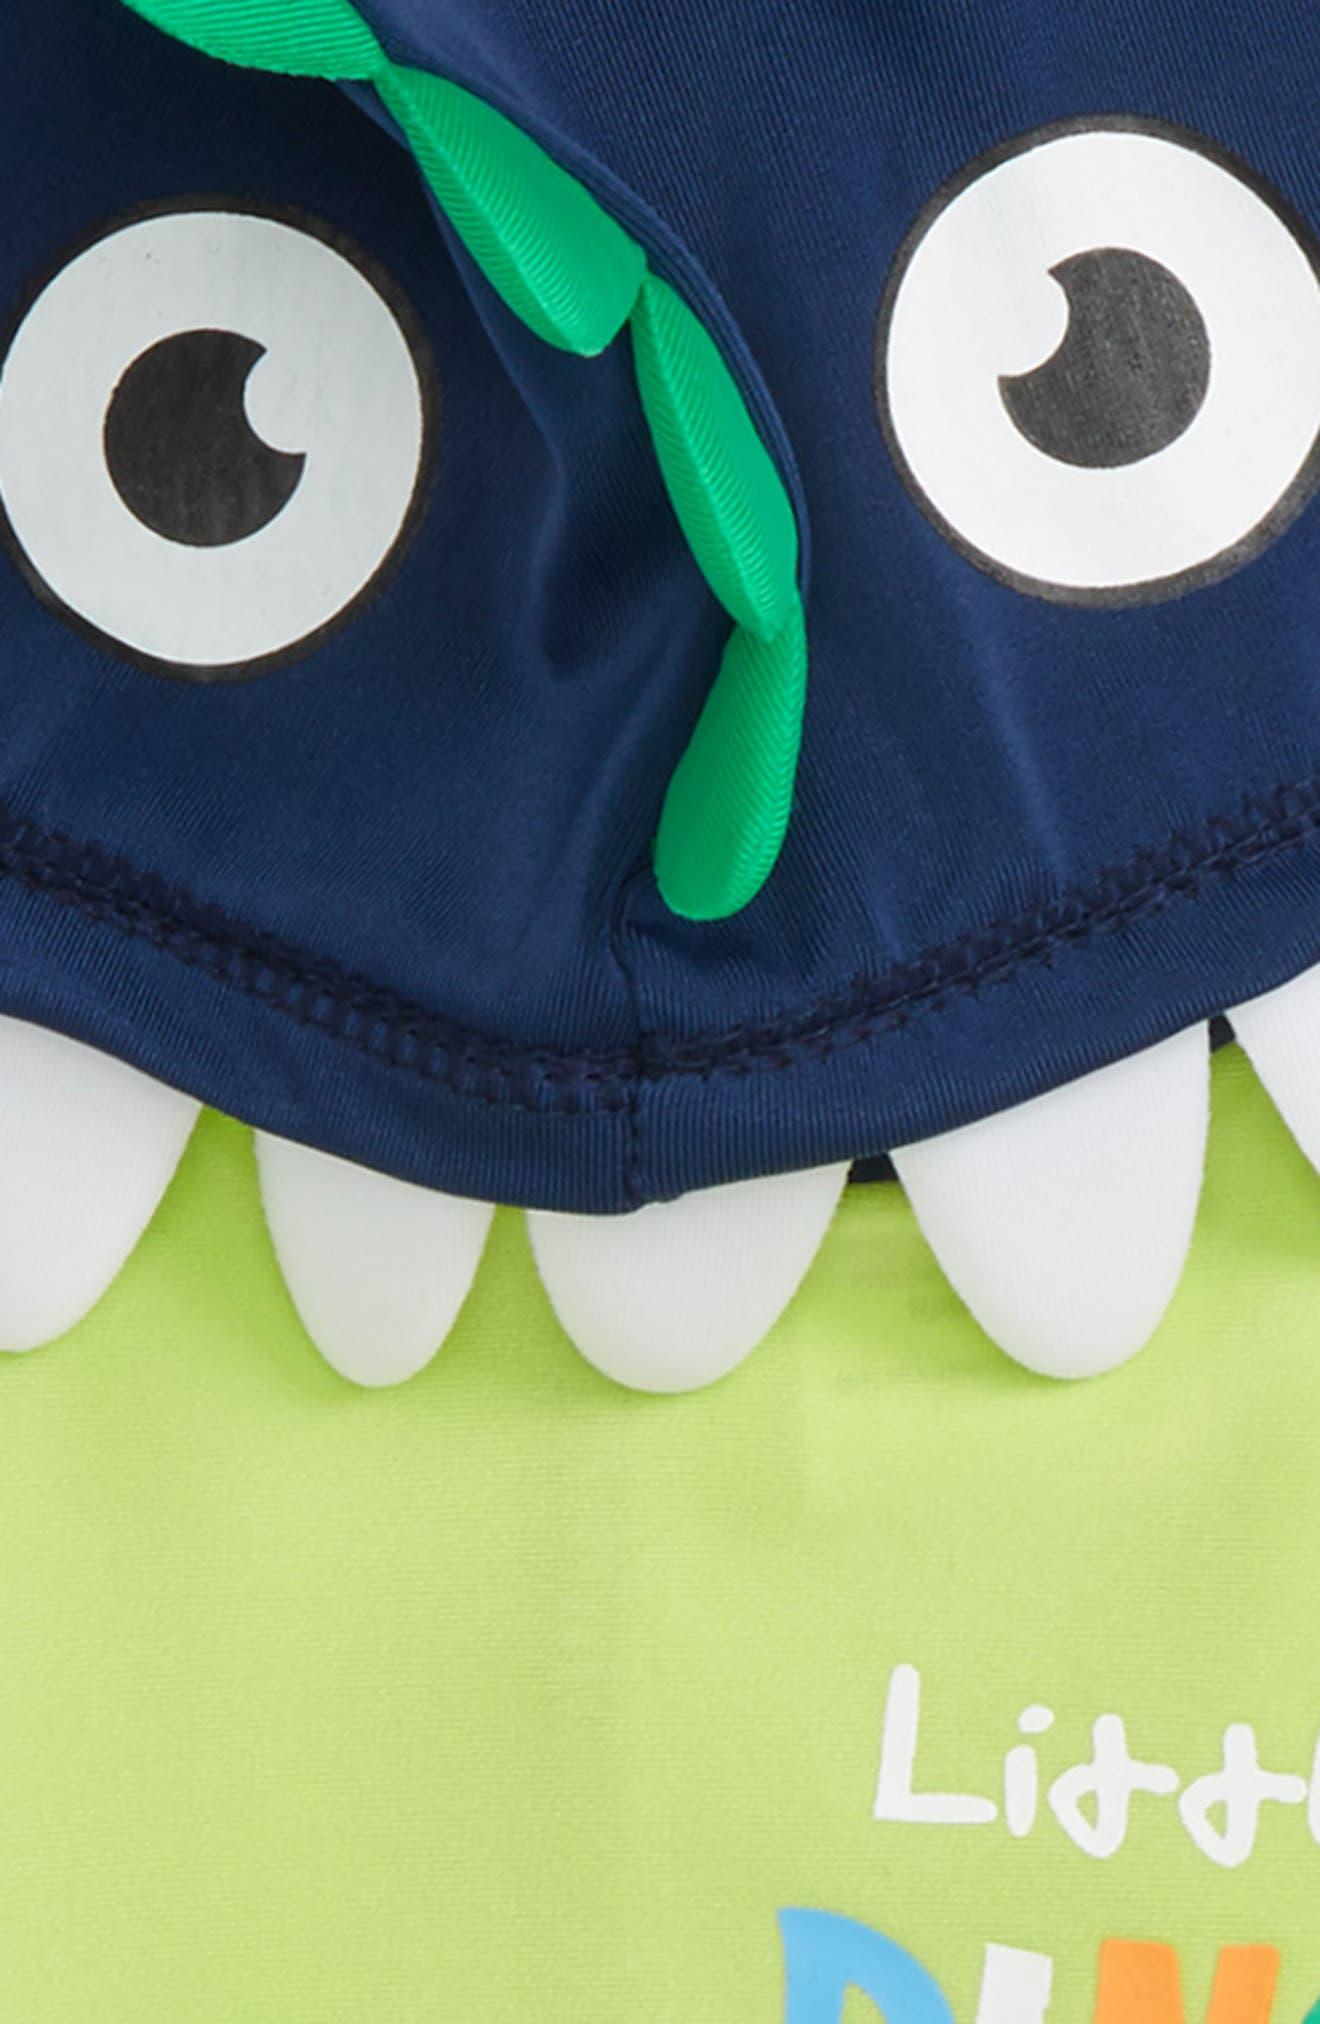 Little Dino Hooded Rashguard & Board Shorts Set,                             Alternate thumbnail 3, color,                             Navy